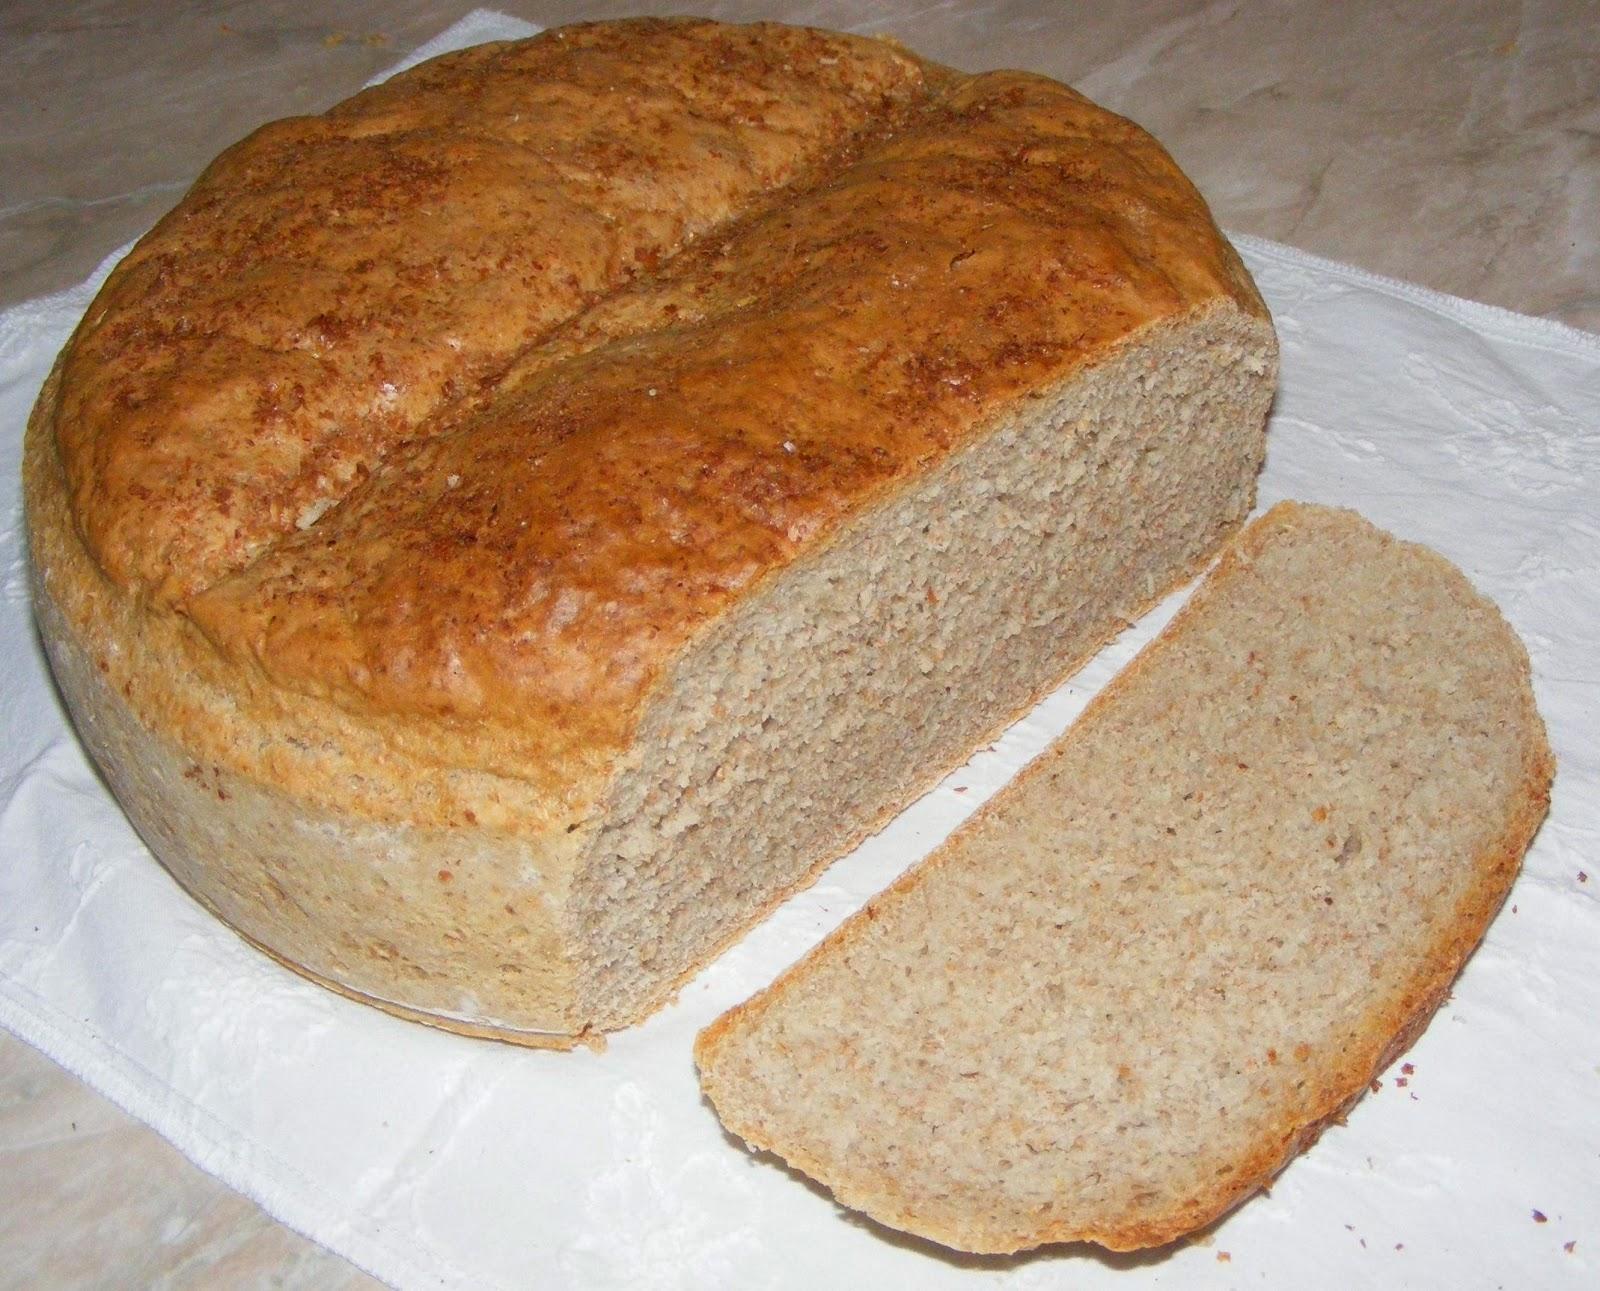 paine, retete paine, reteta paine, paine de casa, paine cu tarate, paine cu tarate de grau, retete culinare, preparate culinare, diete, cura de slabire, diete de slabit, retete de mancare, mancare, paine pufoasa, paine cu seminte, paine integrala, paine neagra,